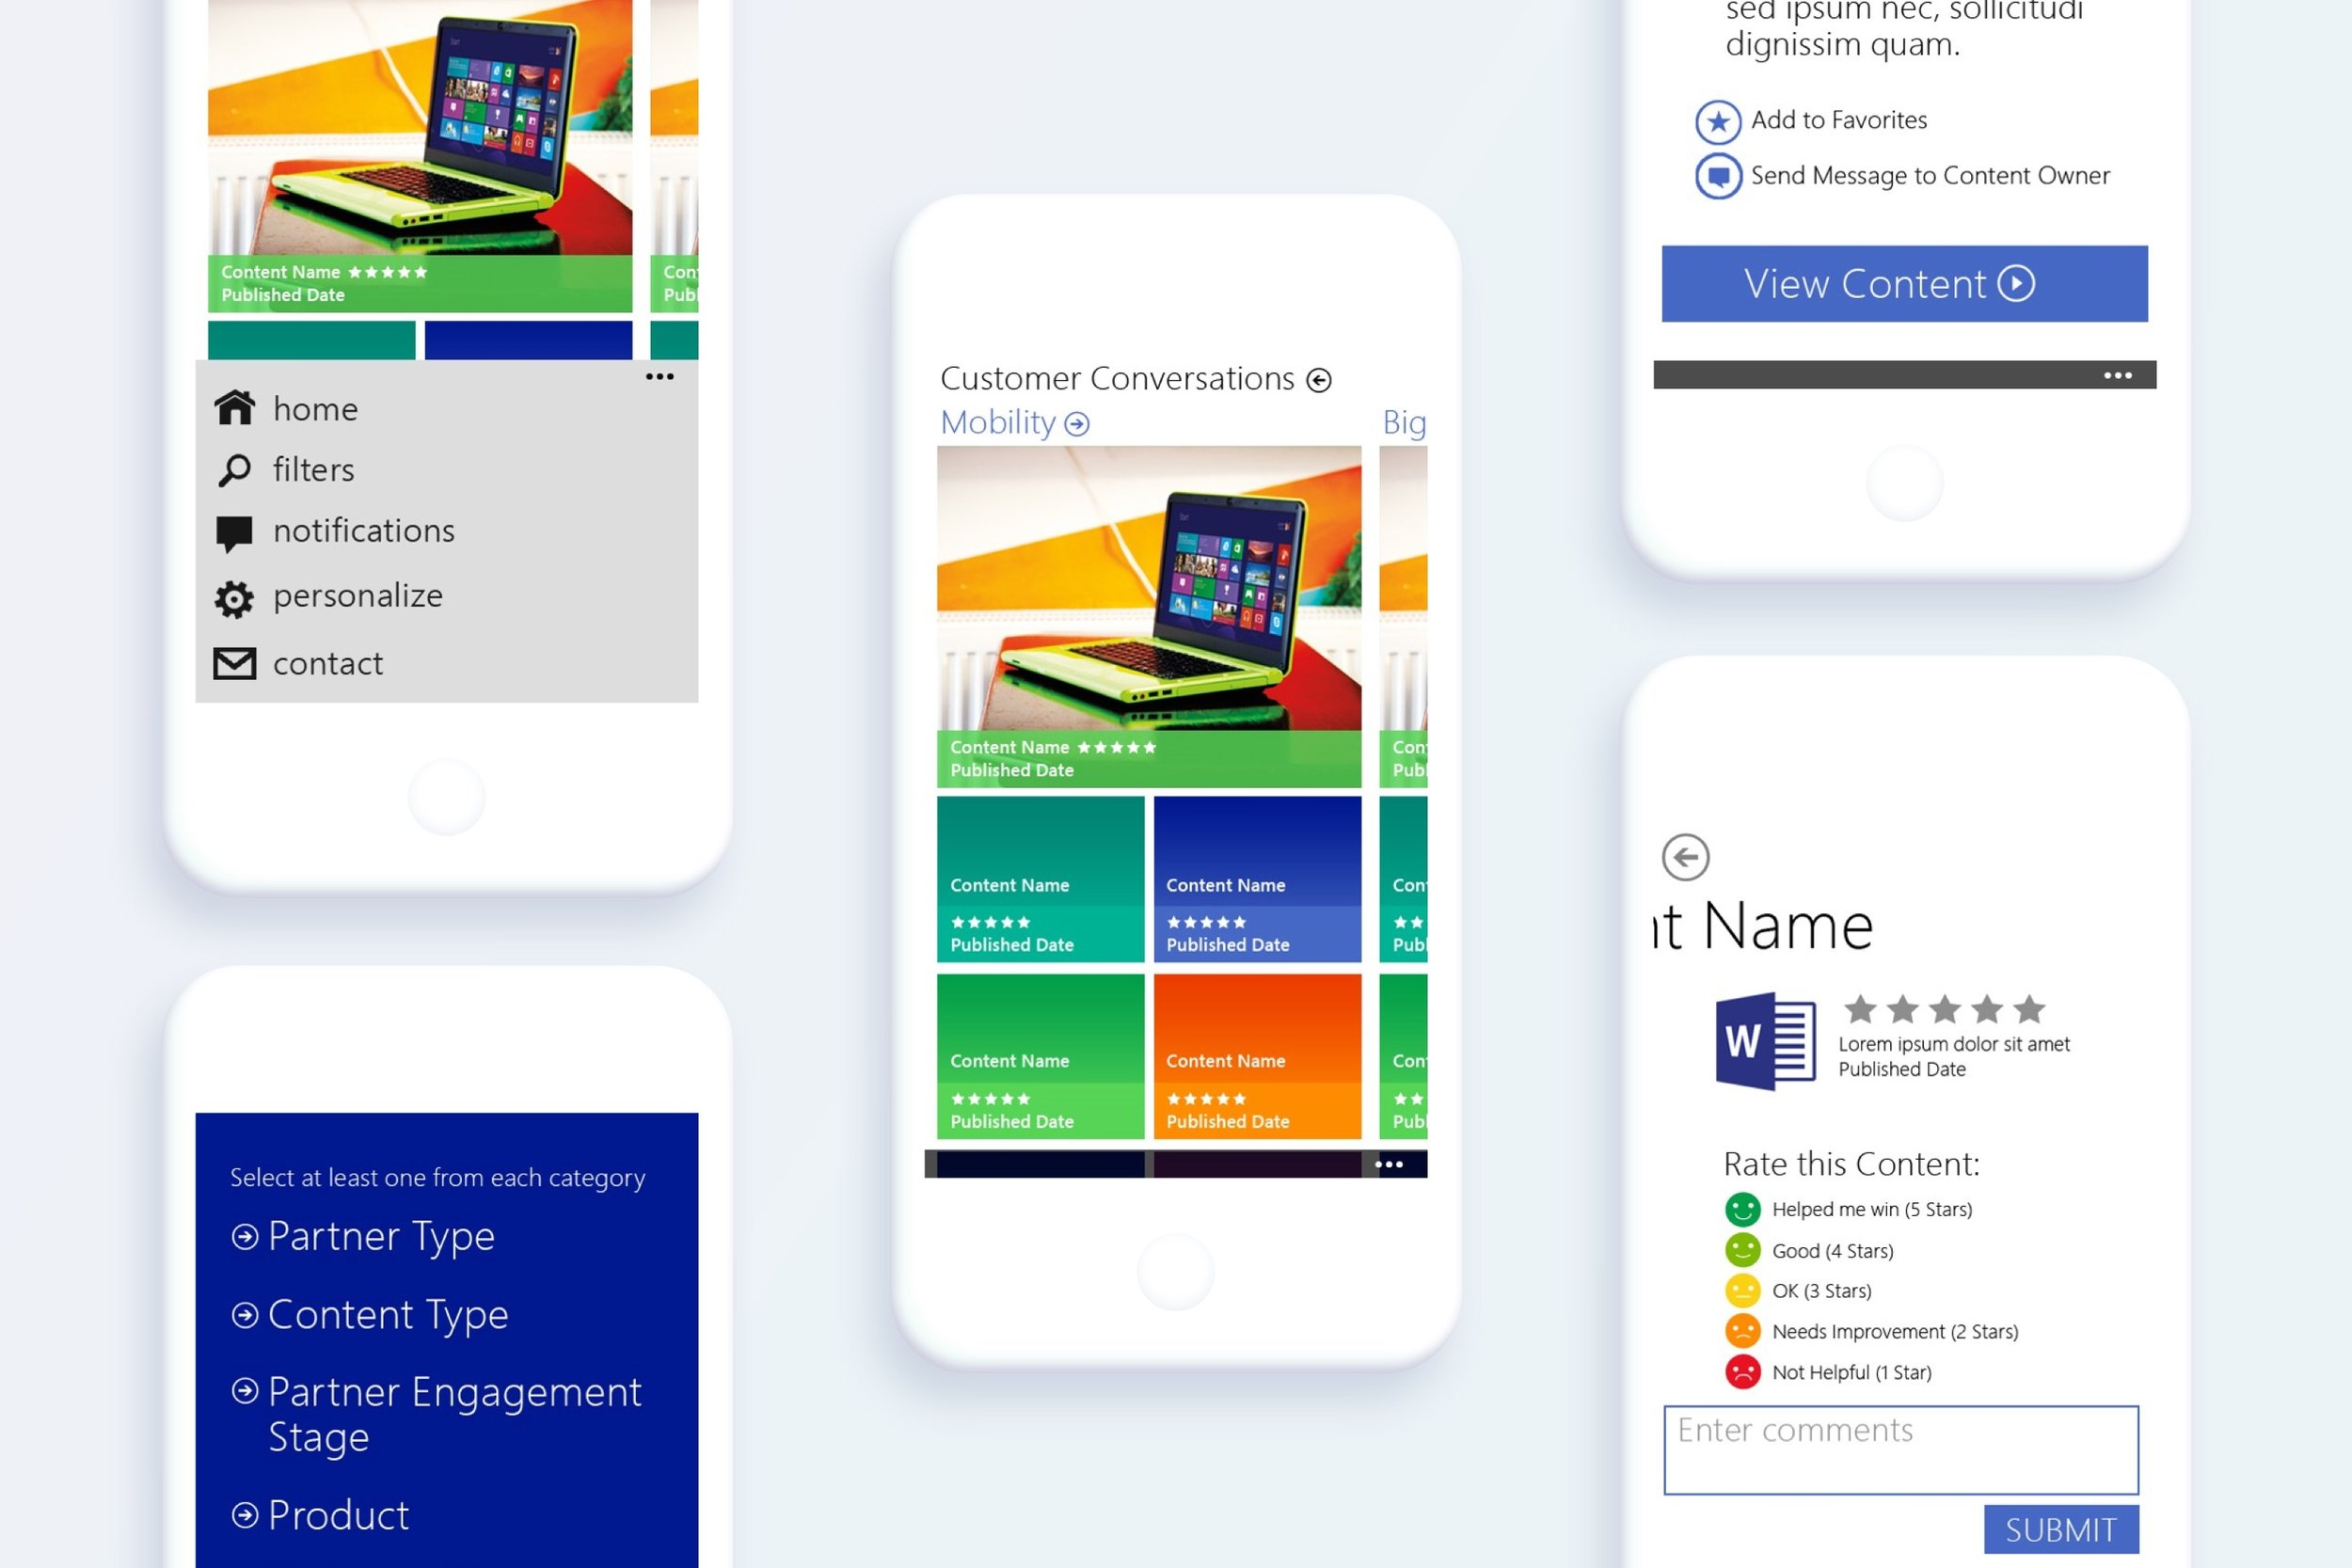 Microsoft Marketing App - Client: Windows Marketing